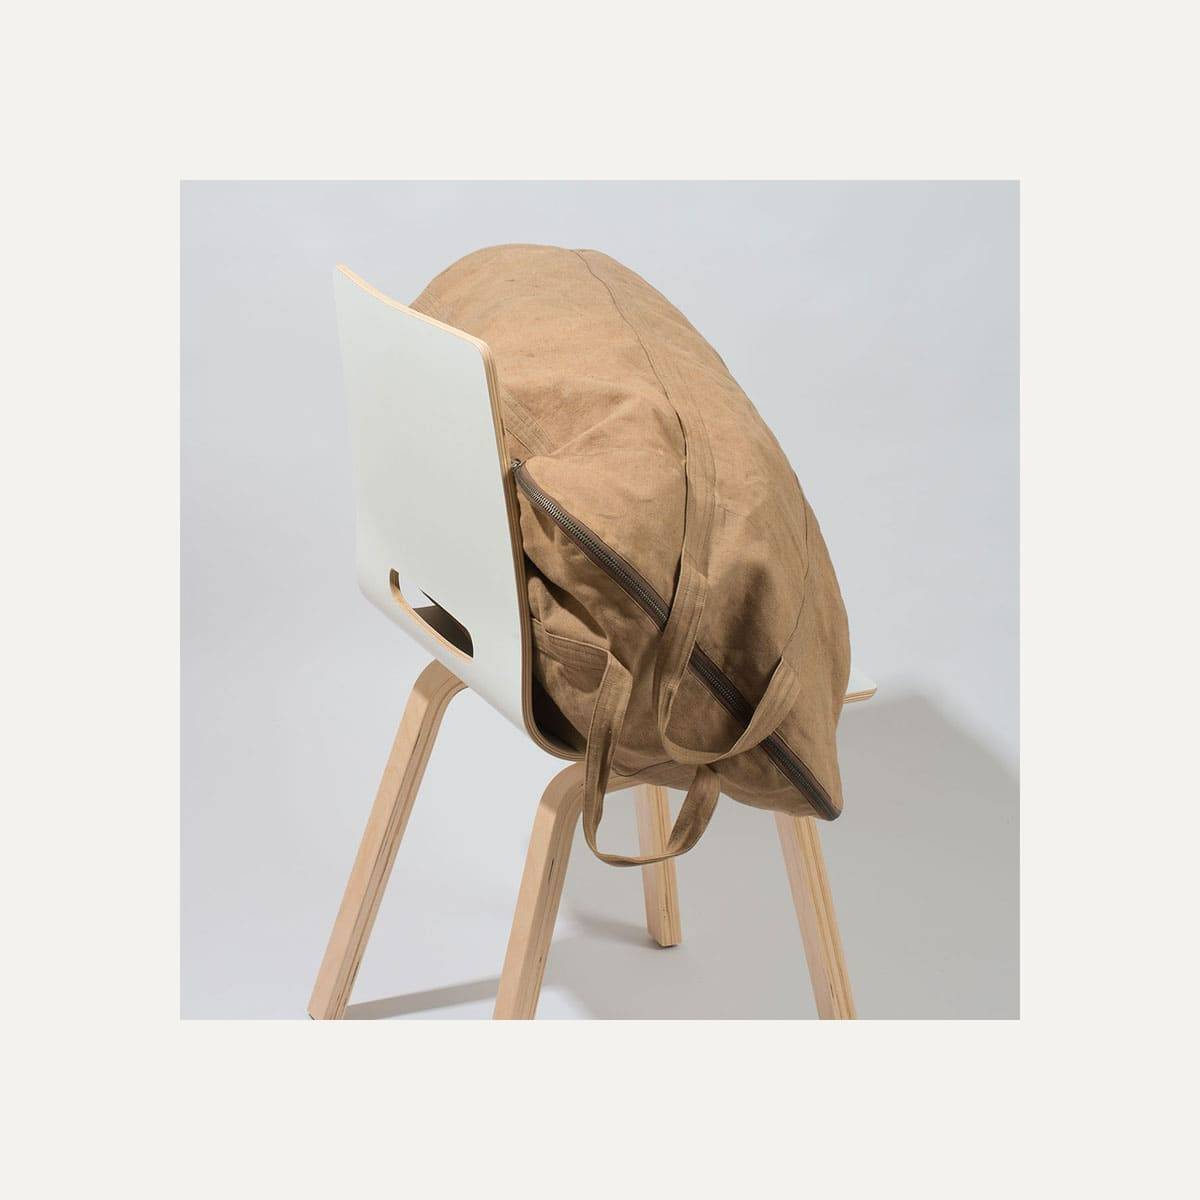 N°4: 'Cashew-colored' linen parachute bag (image n°9)